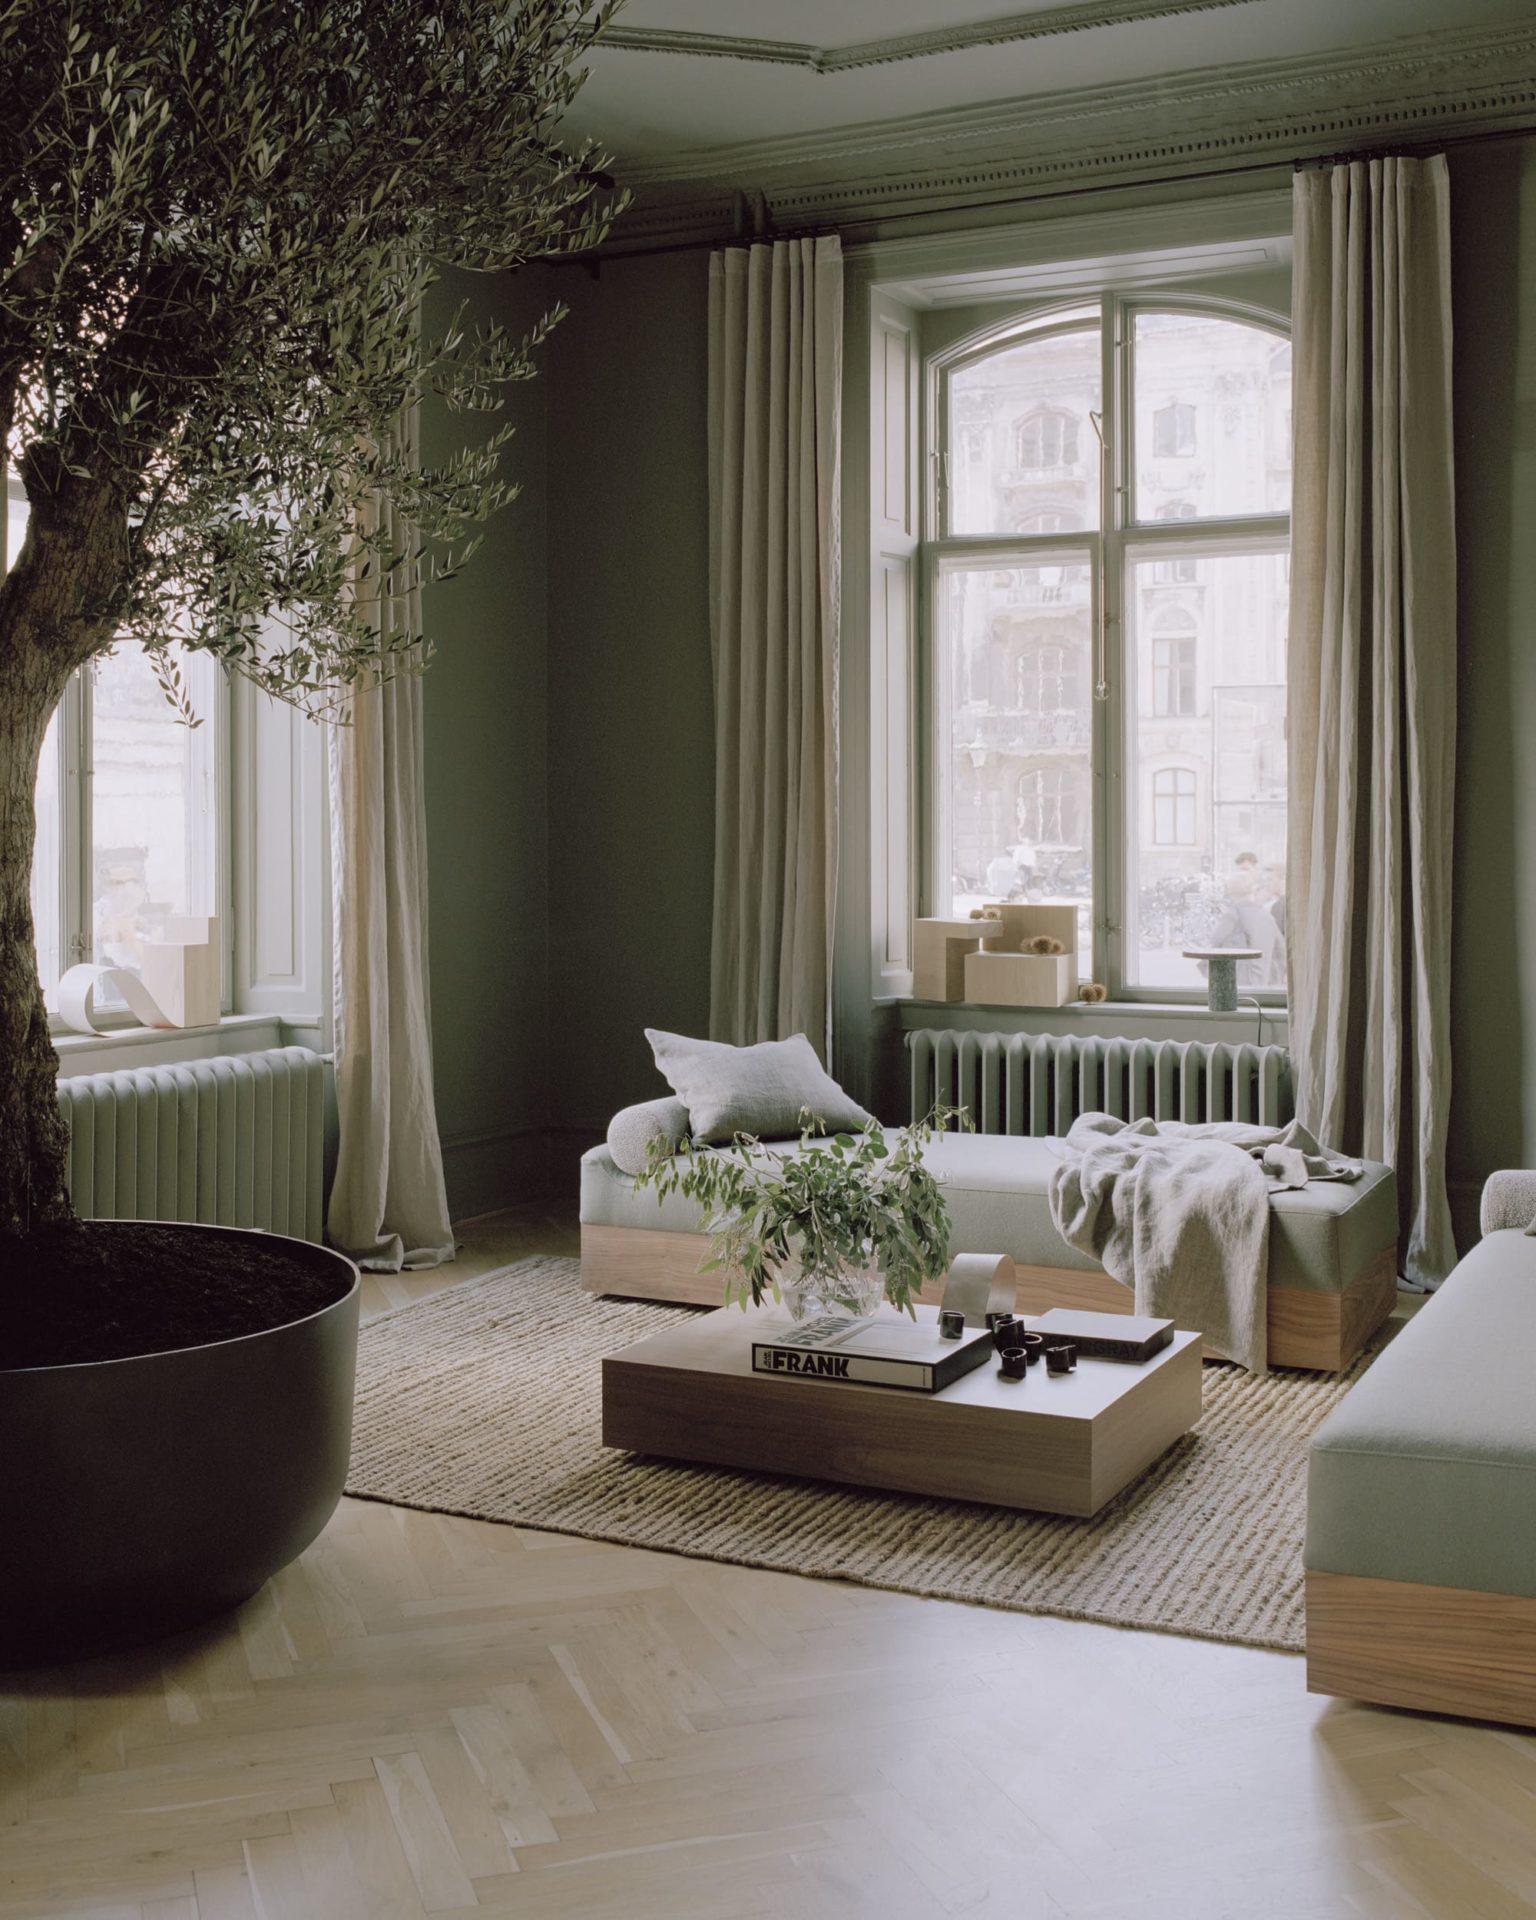 deco-mur-kaki-petit-salon-ambiance-chill